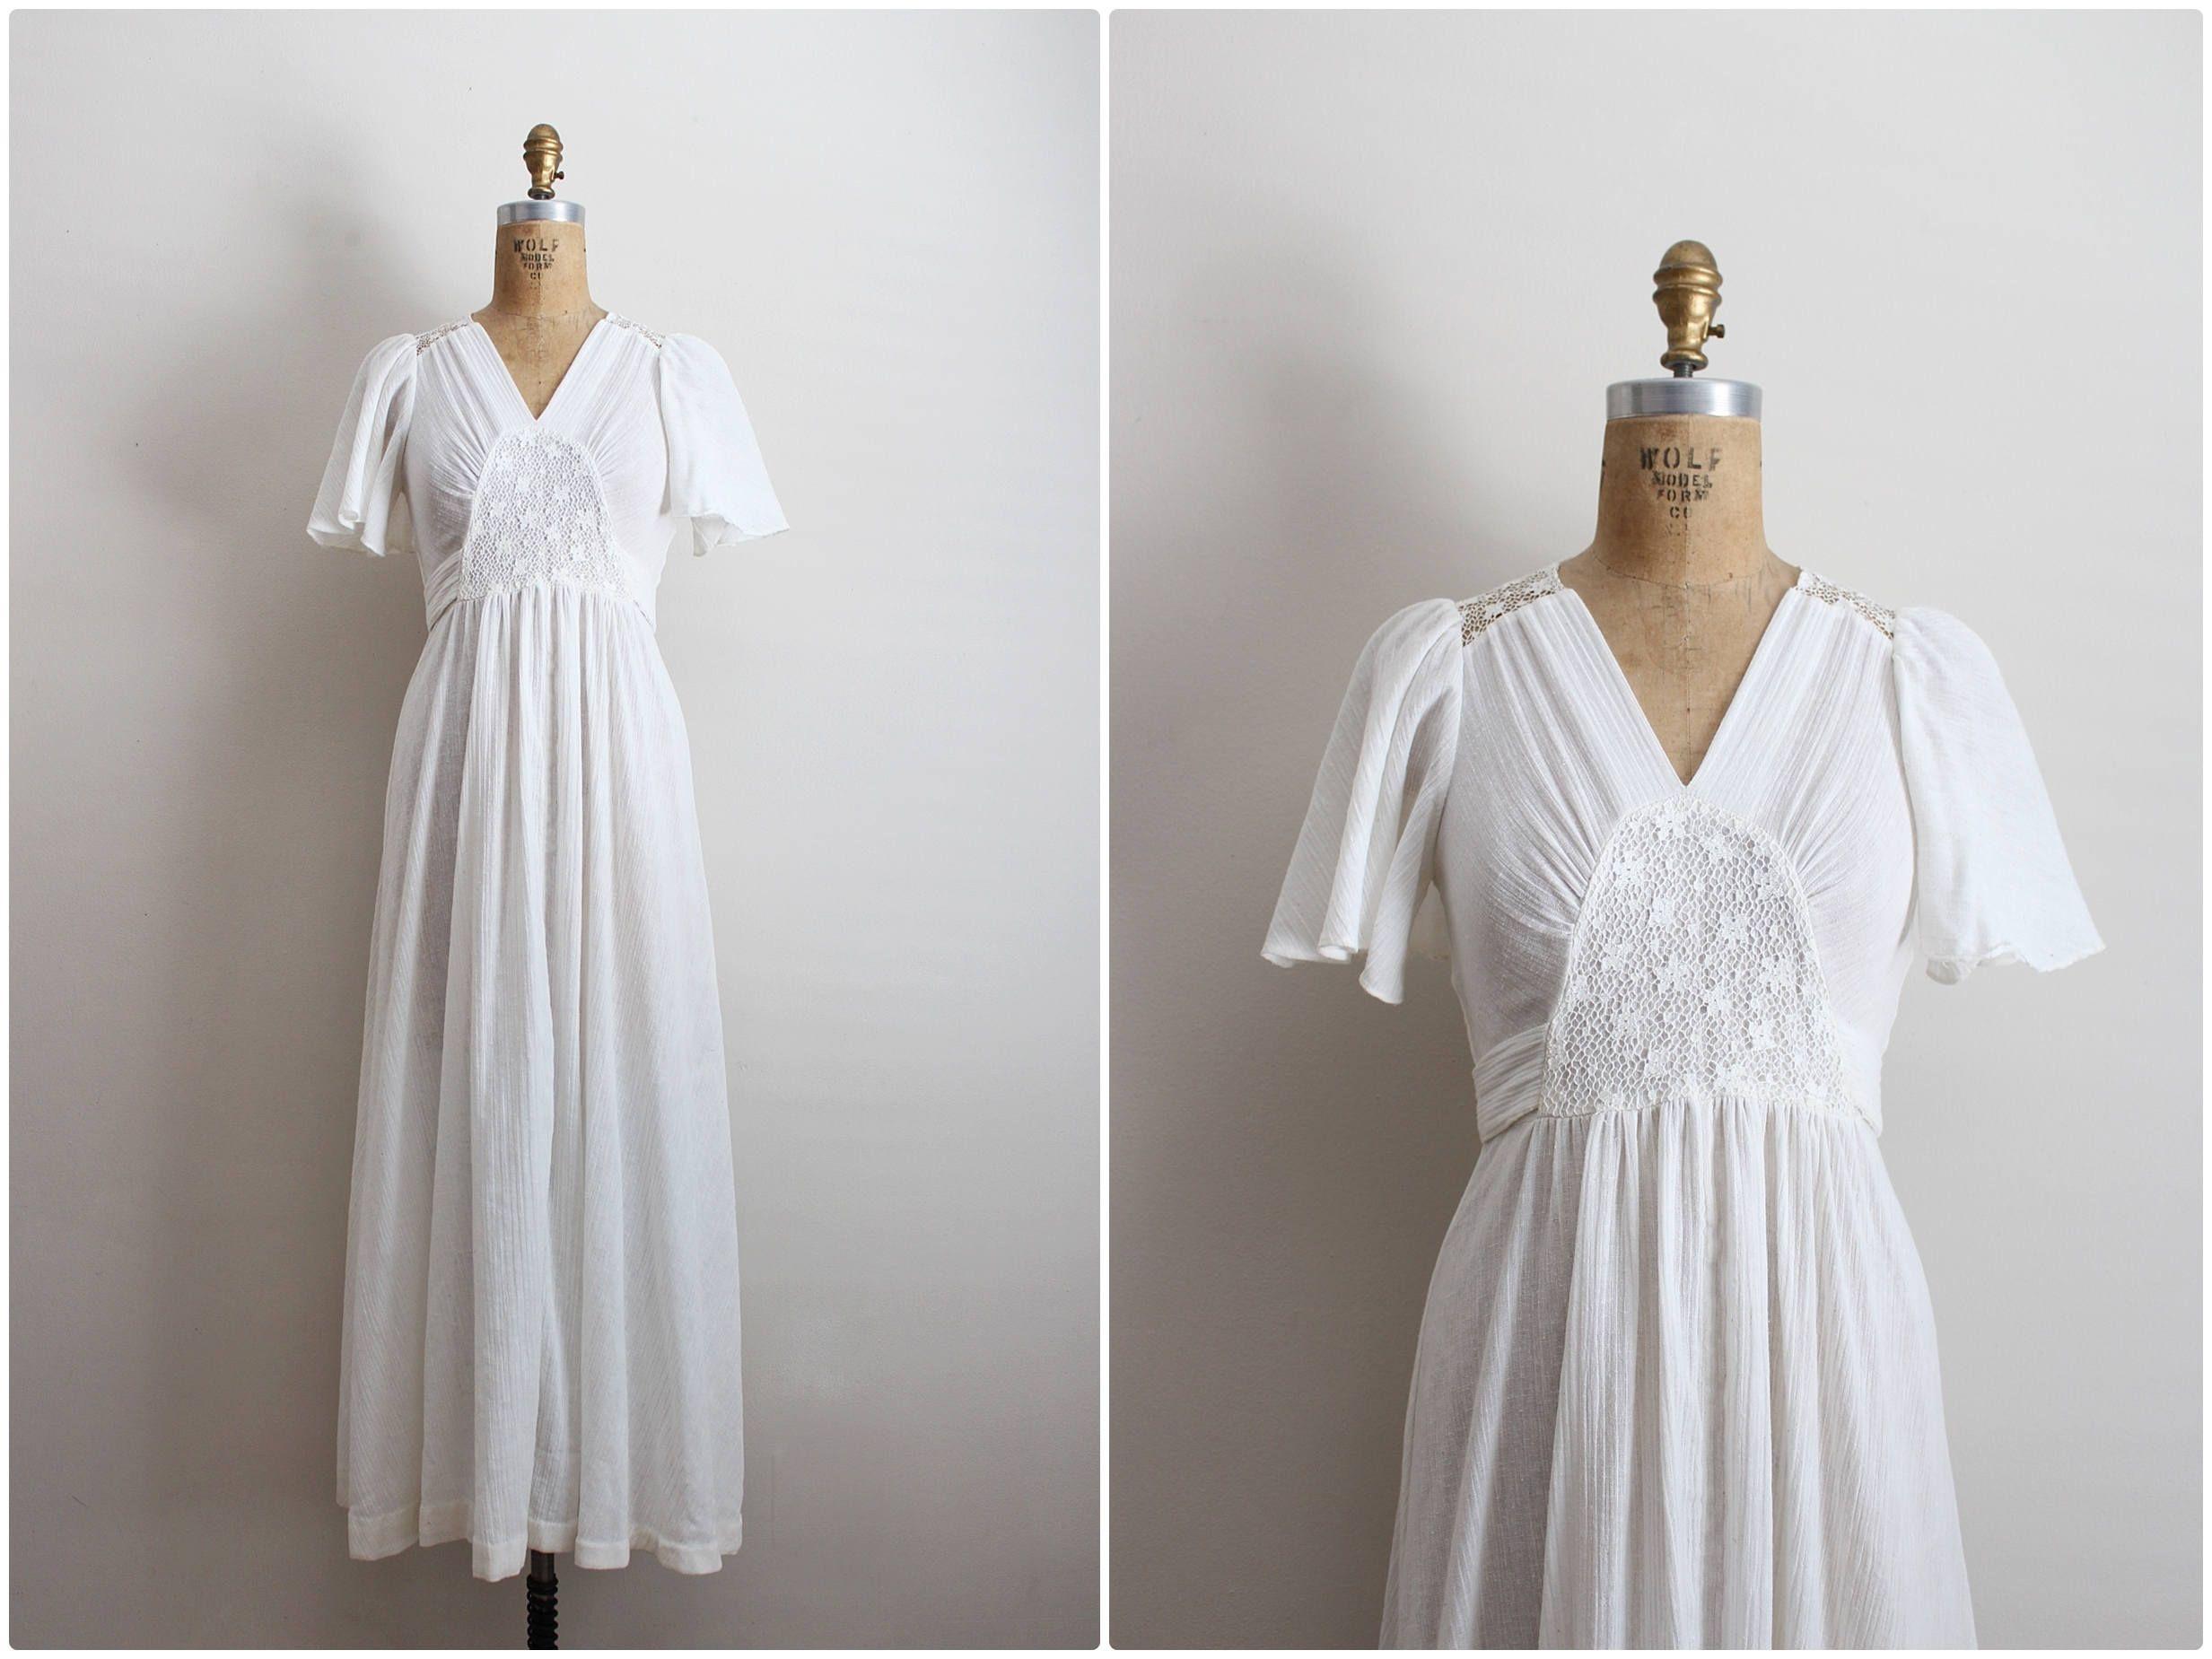 70s White Maxi Dress Vintage Gauze Lace Dress Boho Wedding Etsy Lace Dress Boho Vintage Maxi Dress White Maxi Dresses [ 1849 x 2465 Pixel ]